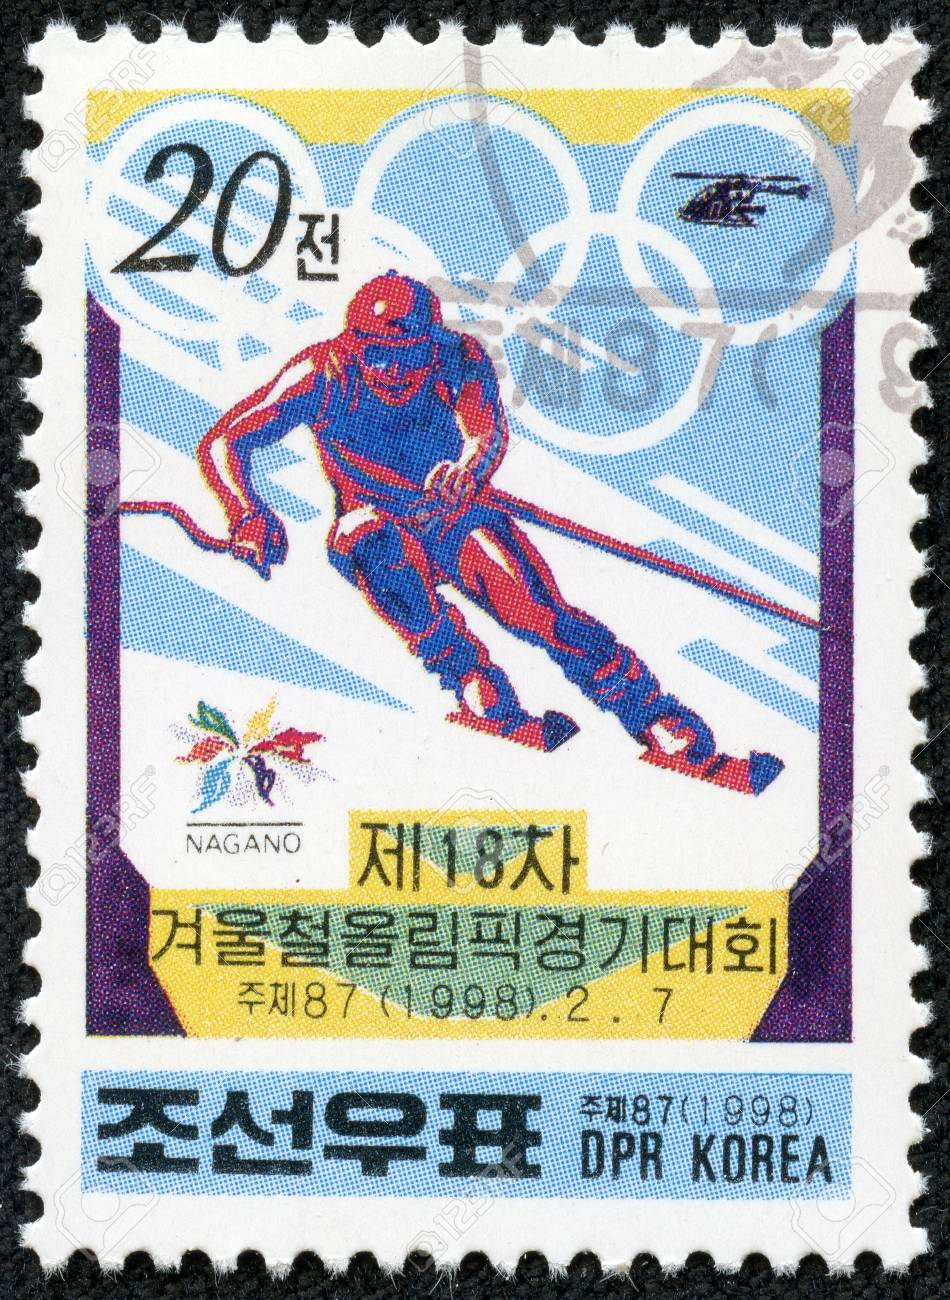 KOREA - CIRCA 1998  stamp printed by Korea, shows slalom, circa 1998  Stock Photo - 20345183